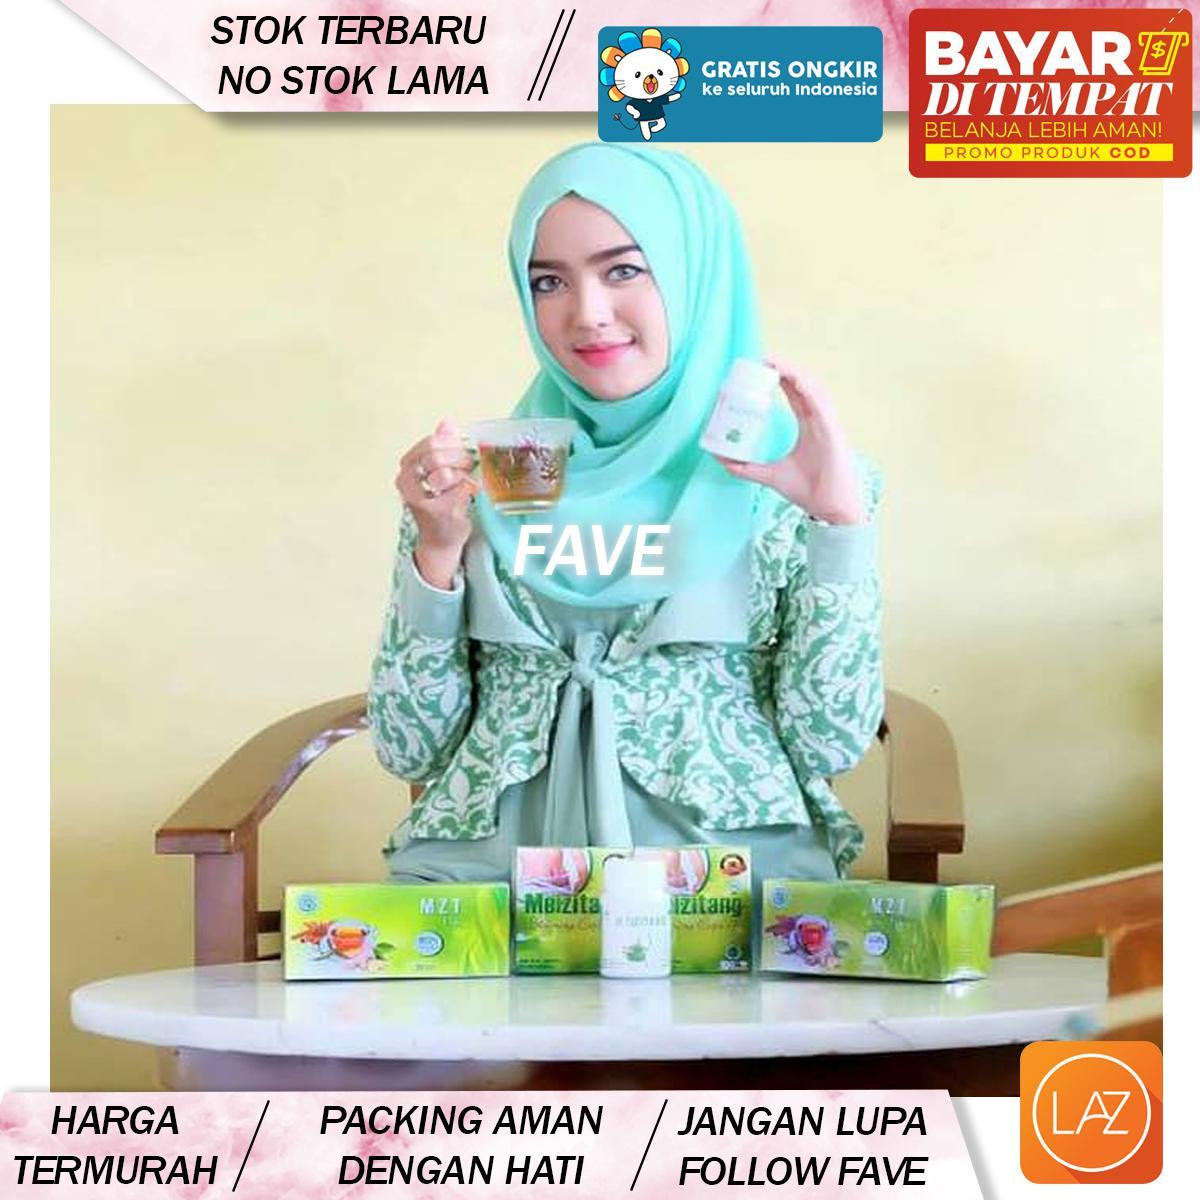 Fave COD - Meizitang BPOM / Meizitang Slimming Capsule BPOM - Fave / A37